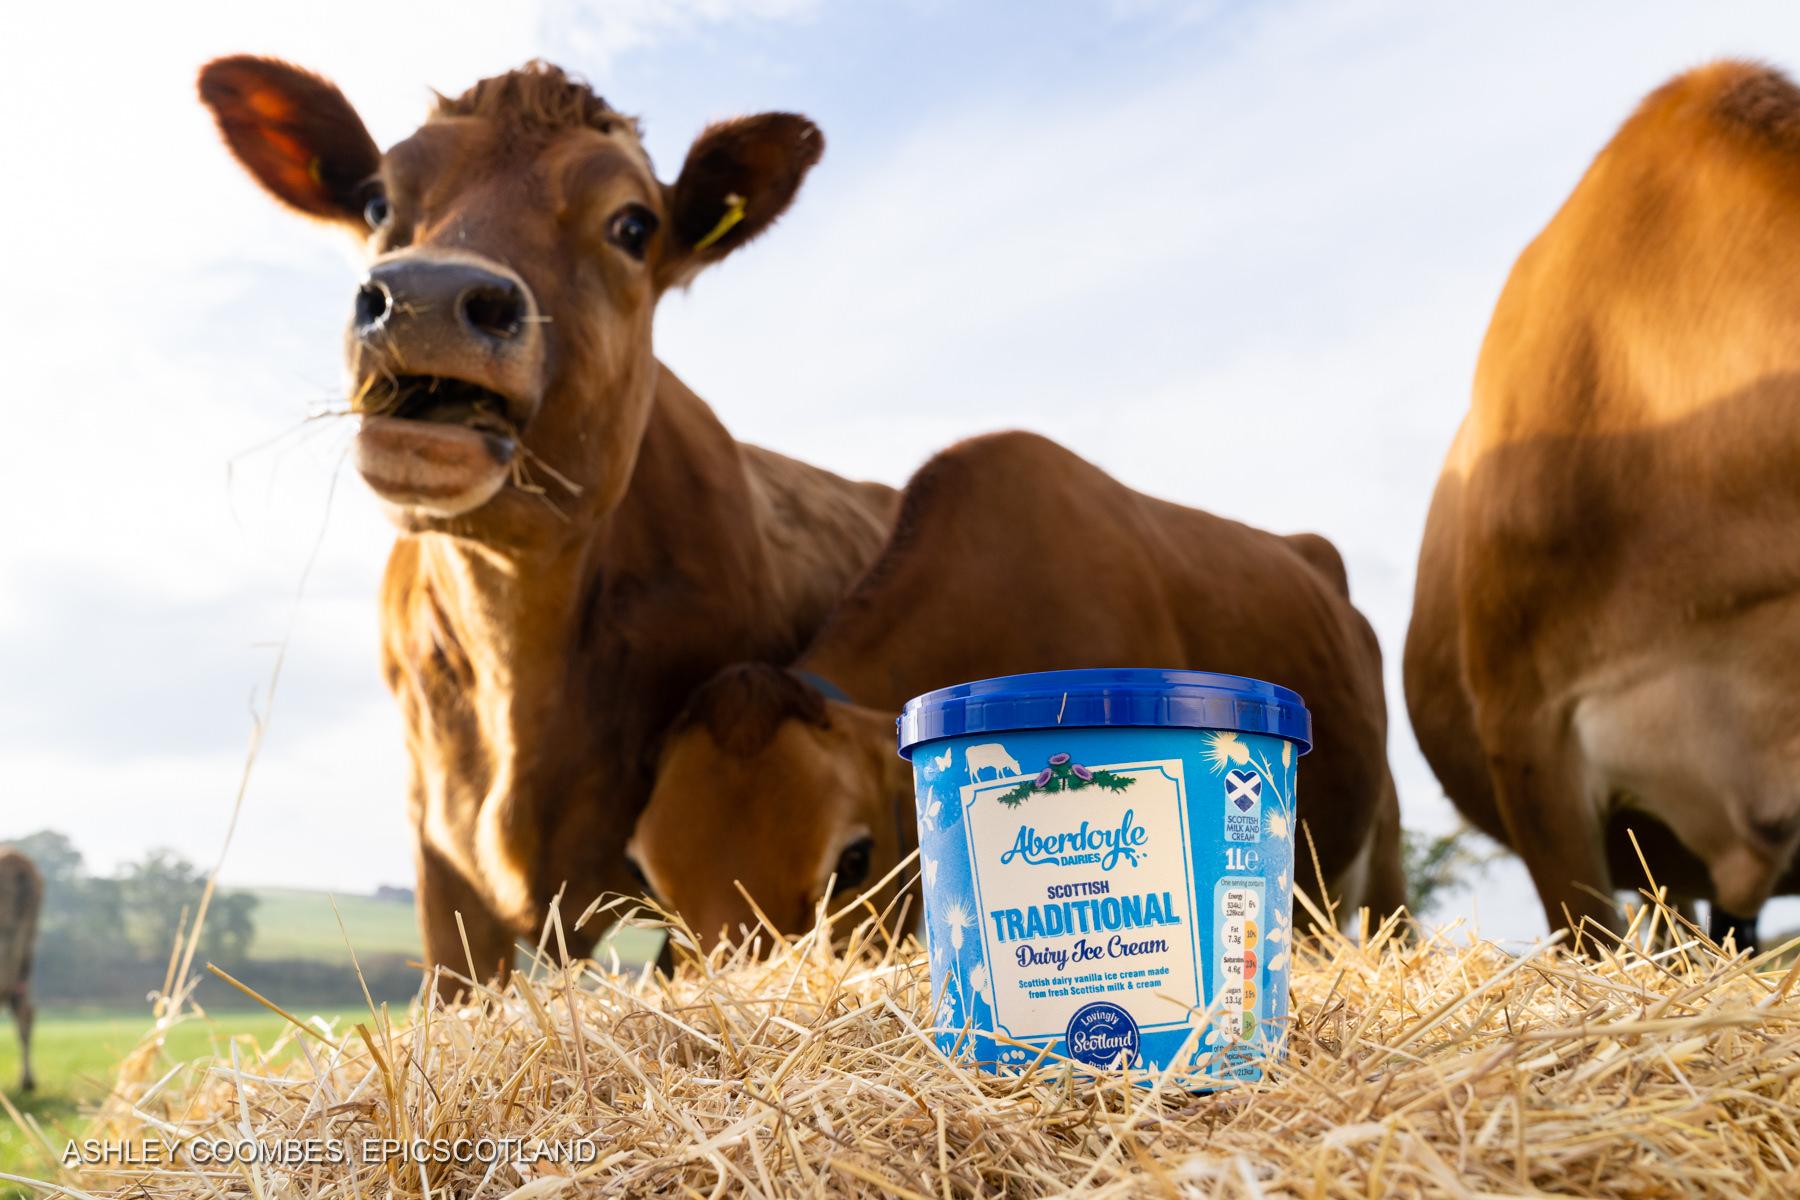 Graham's Dairy Farm ice cream Epic Scotland Photography